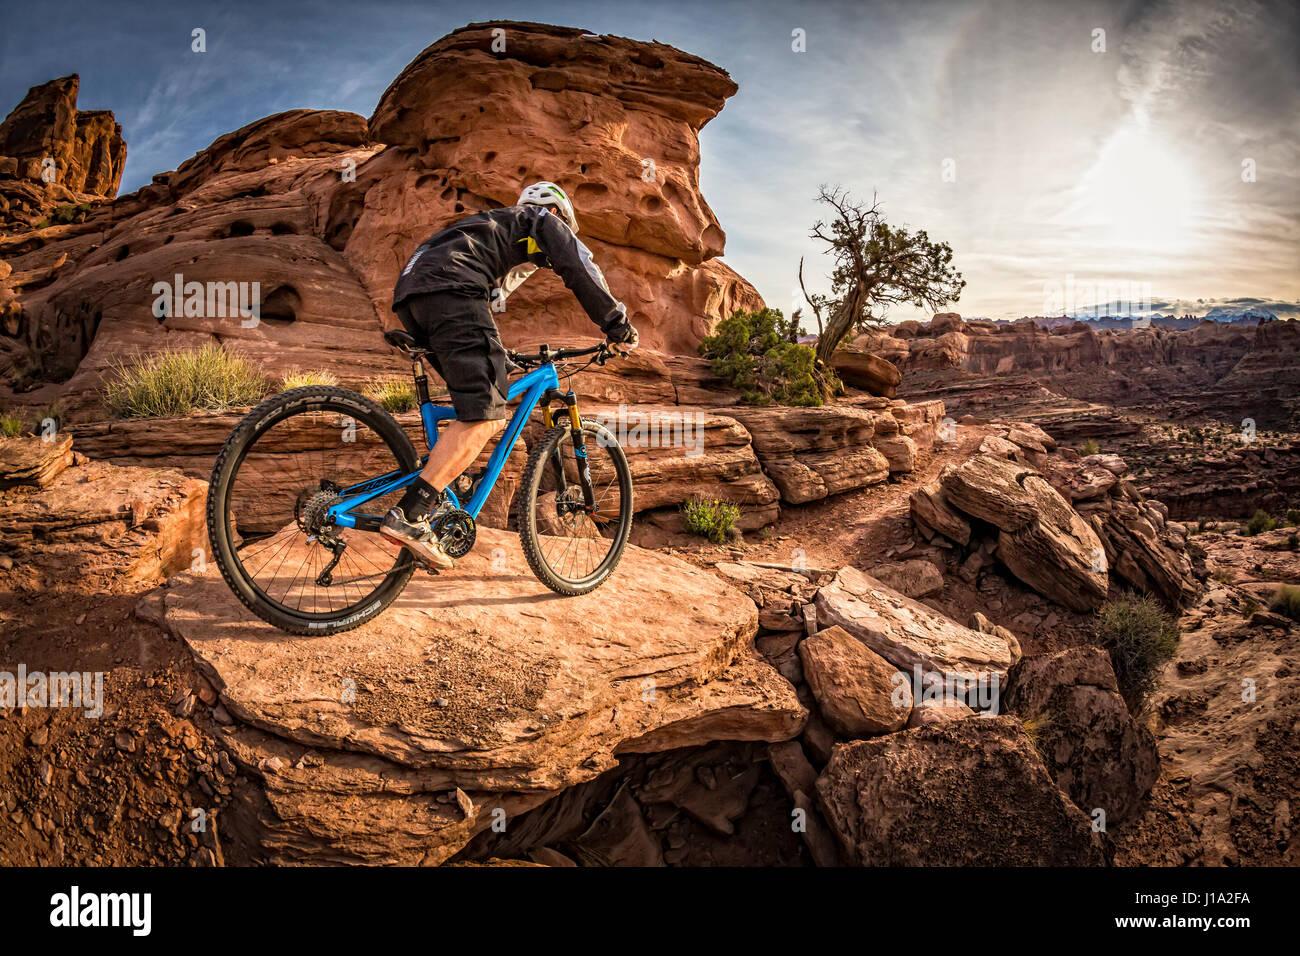 Kyle Mears mountain bike por el sendero Hymasa, Moab, Utah. Imagen De Stock